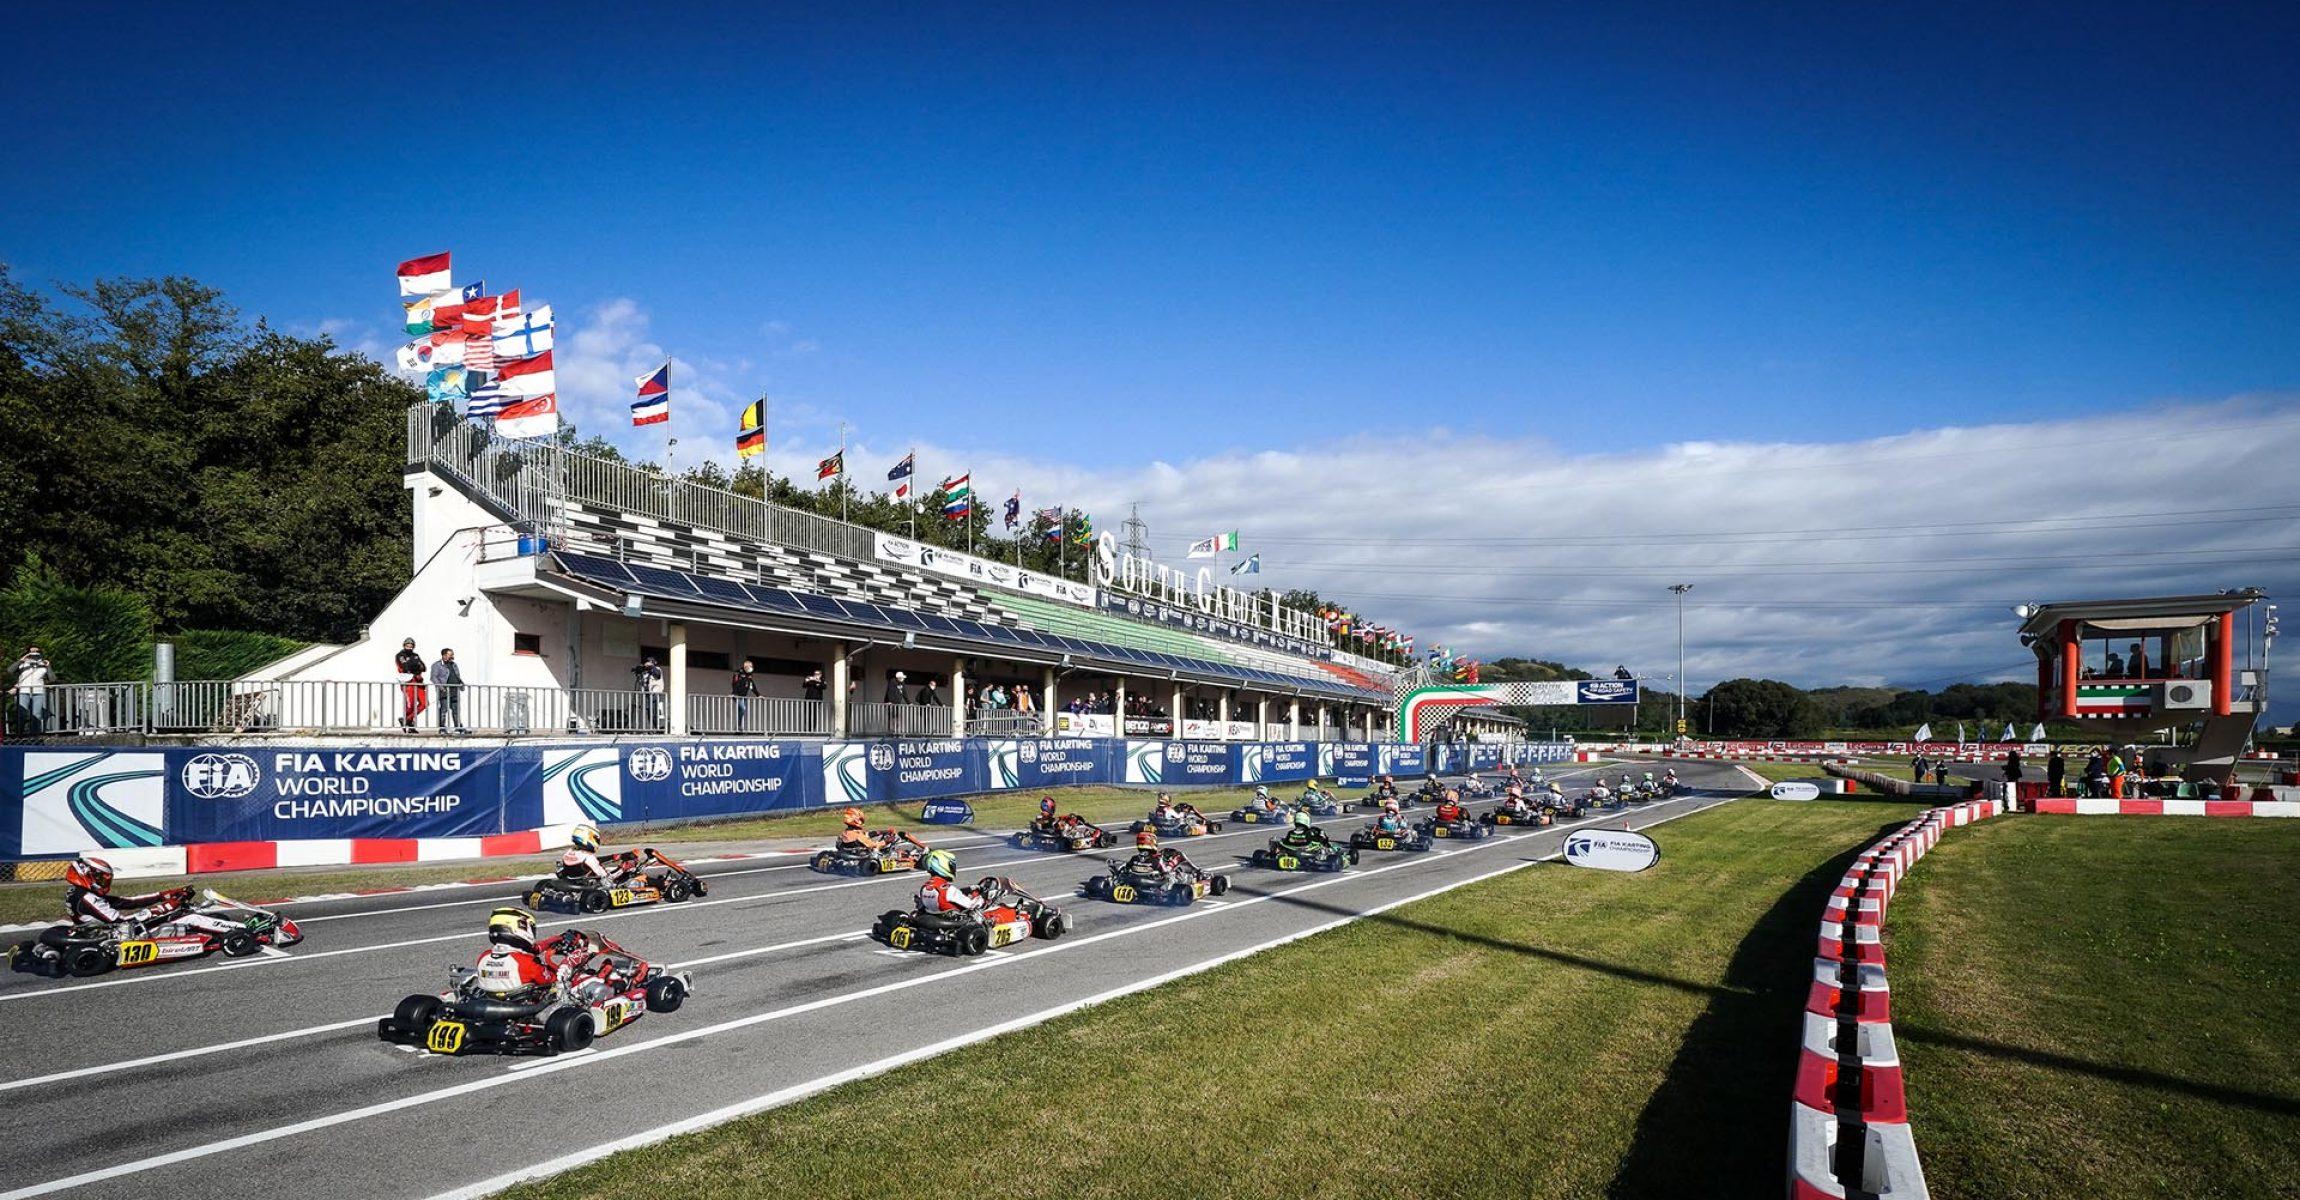 , , , , , FIA Karting World Championship – KZ, FIA Karting International Super Cup – KZ2 & FIA Karting Academy Trophy , LONATO, International Race, © KSP Reportages